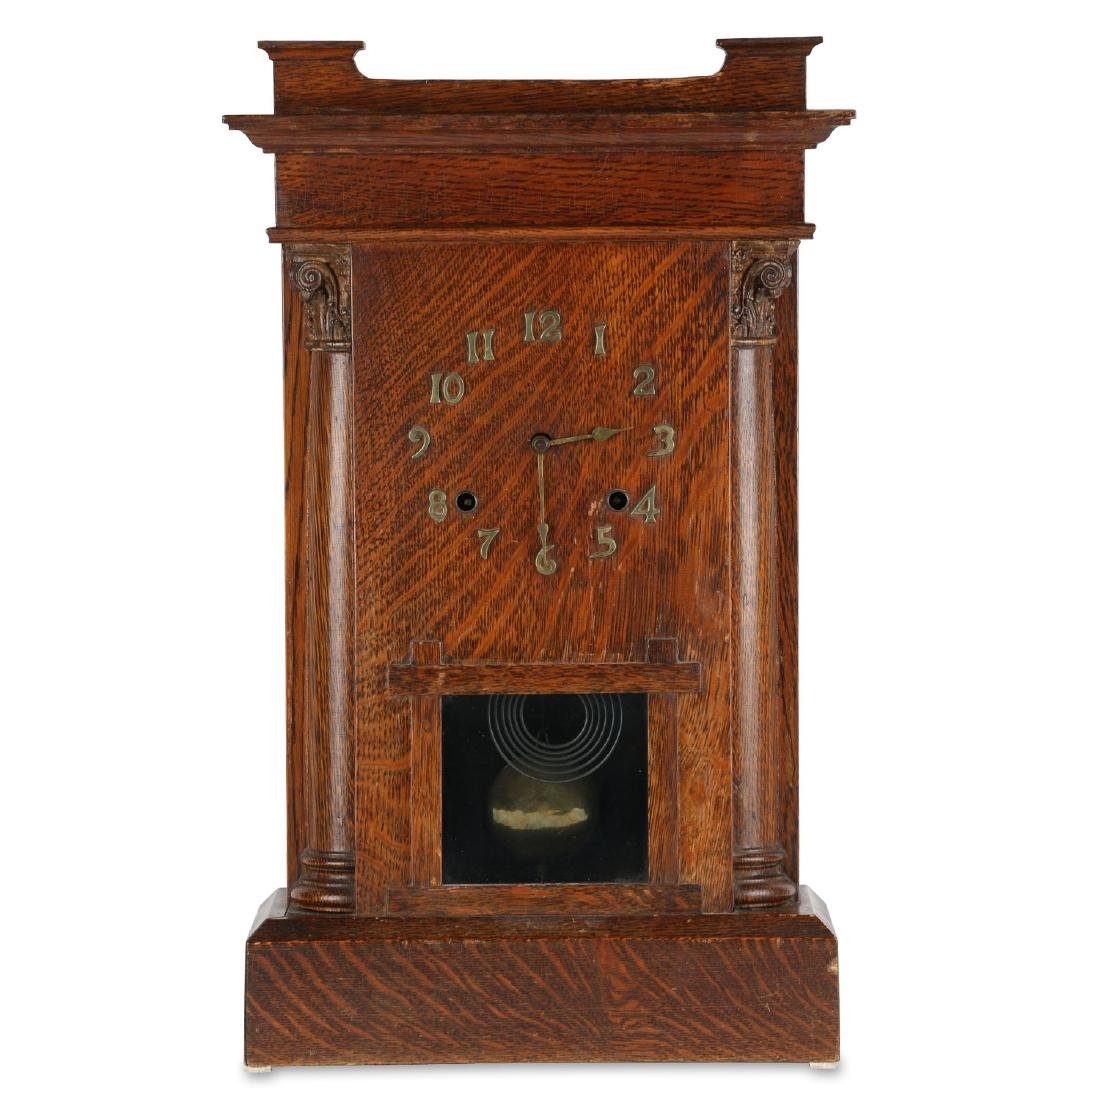 "Pequegnat ""St. Thomas"" Mantel Clock"